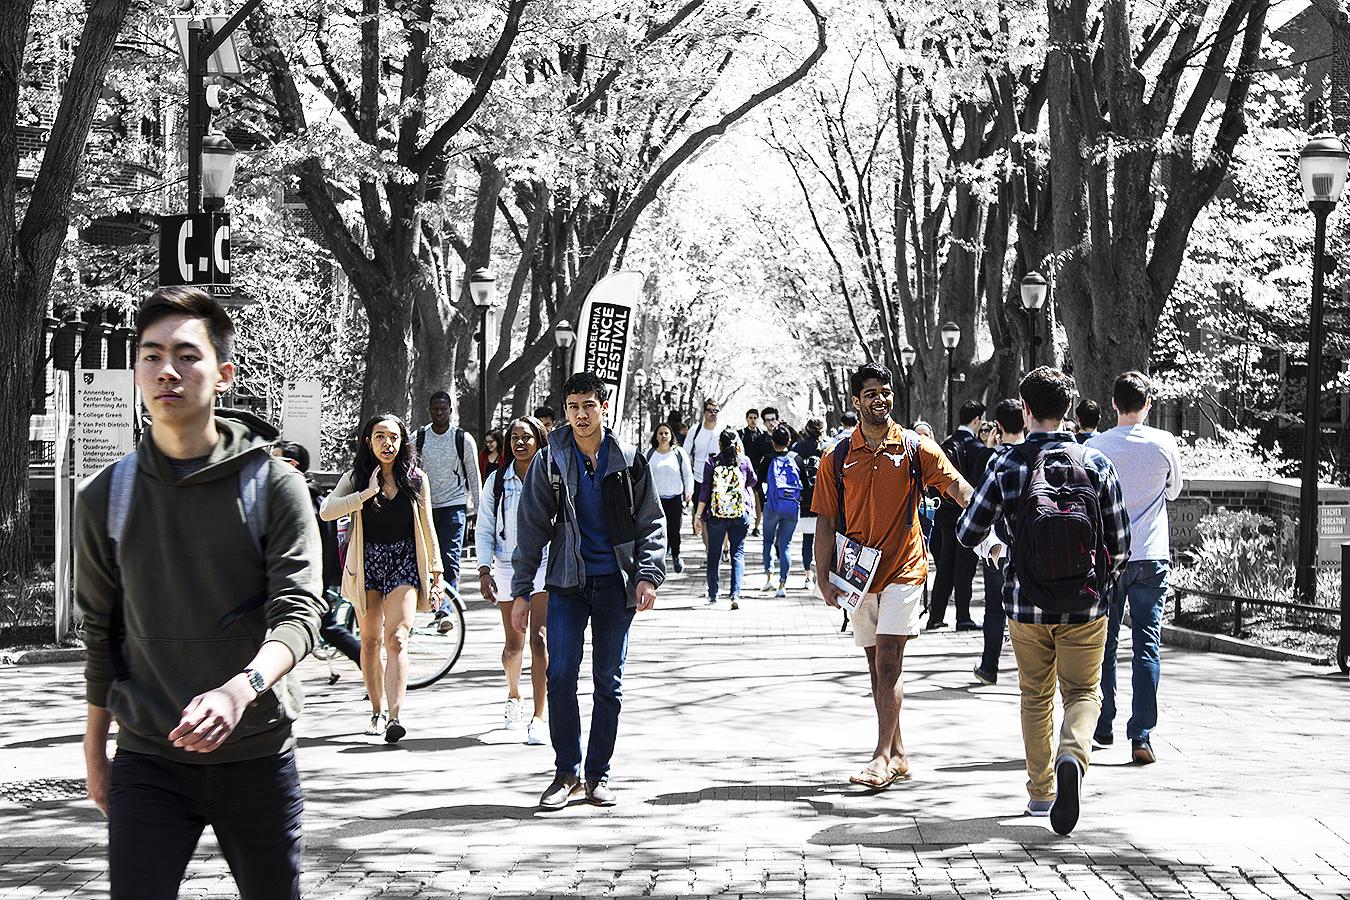 Janelle_Tong_Photography_Tony_Ward_Studio_Political_Project_UPenn_3_Student_Diversity_Locust_Walk_Walking_DP_Compass